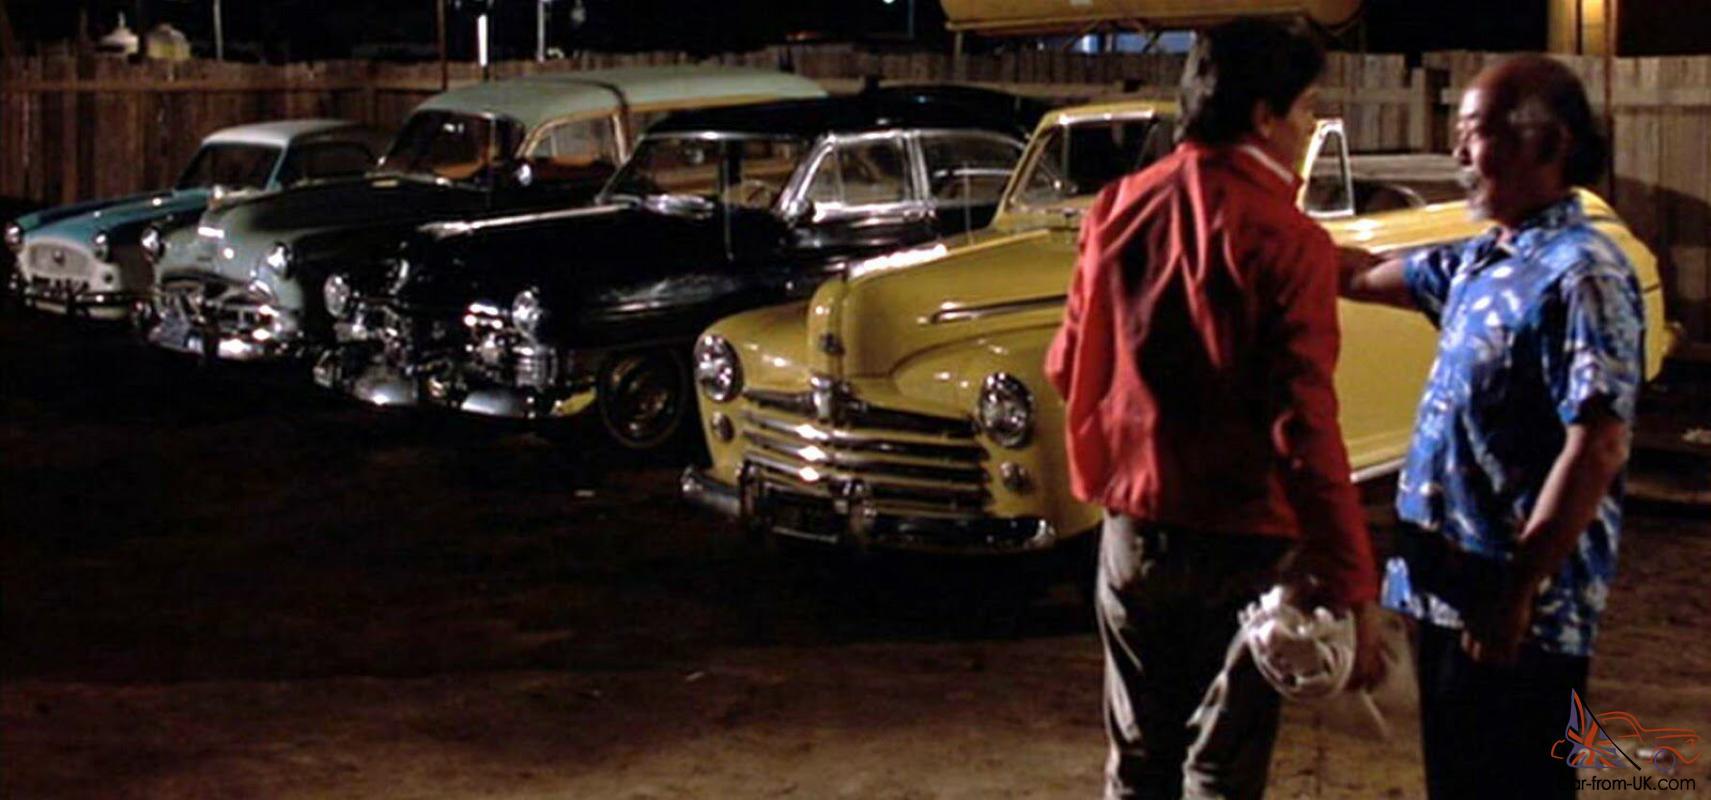 Ford 1947 Convertible Movie Car Karate Kid Wax On Wax Off Prop